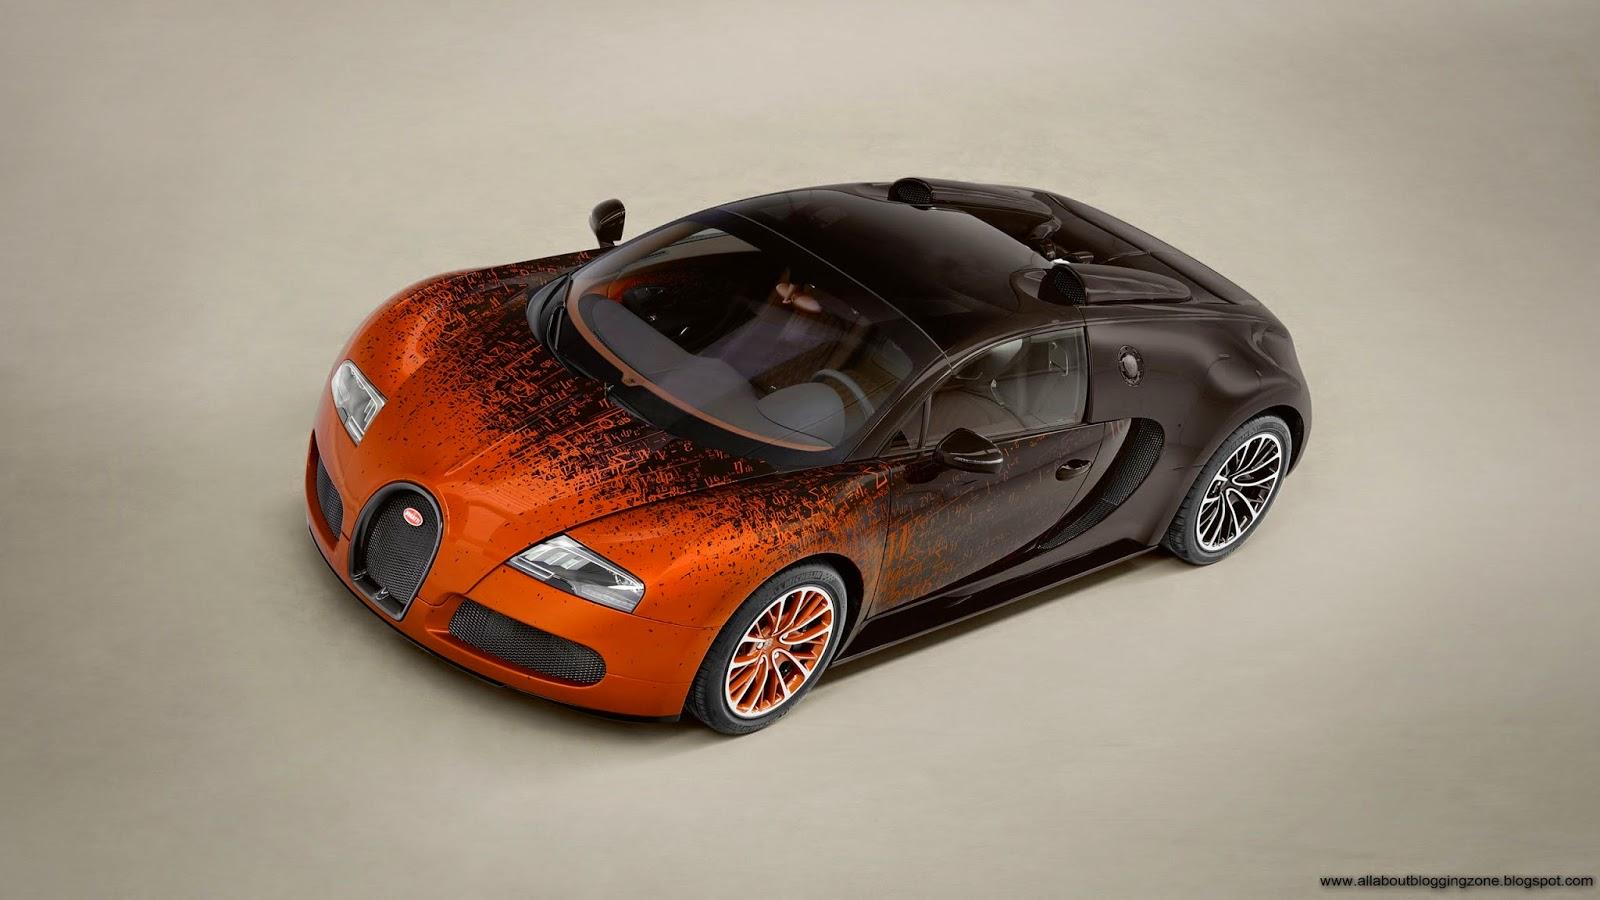 Top 63 Car Wallpapers Hd 1080 Free Download 2560x1440 Desktop Or